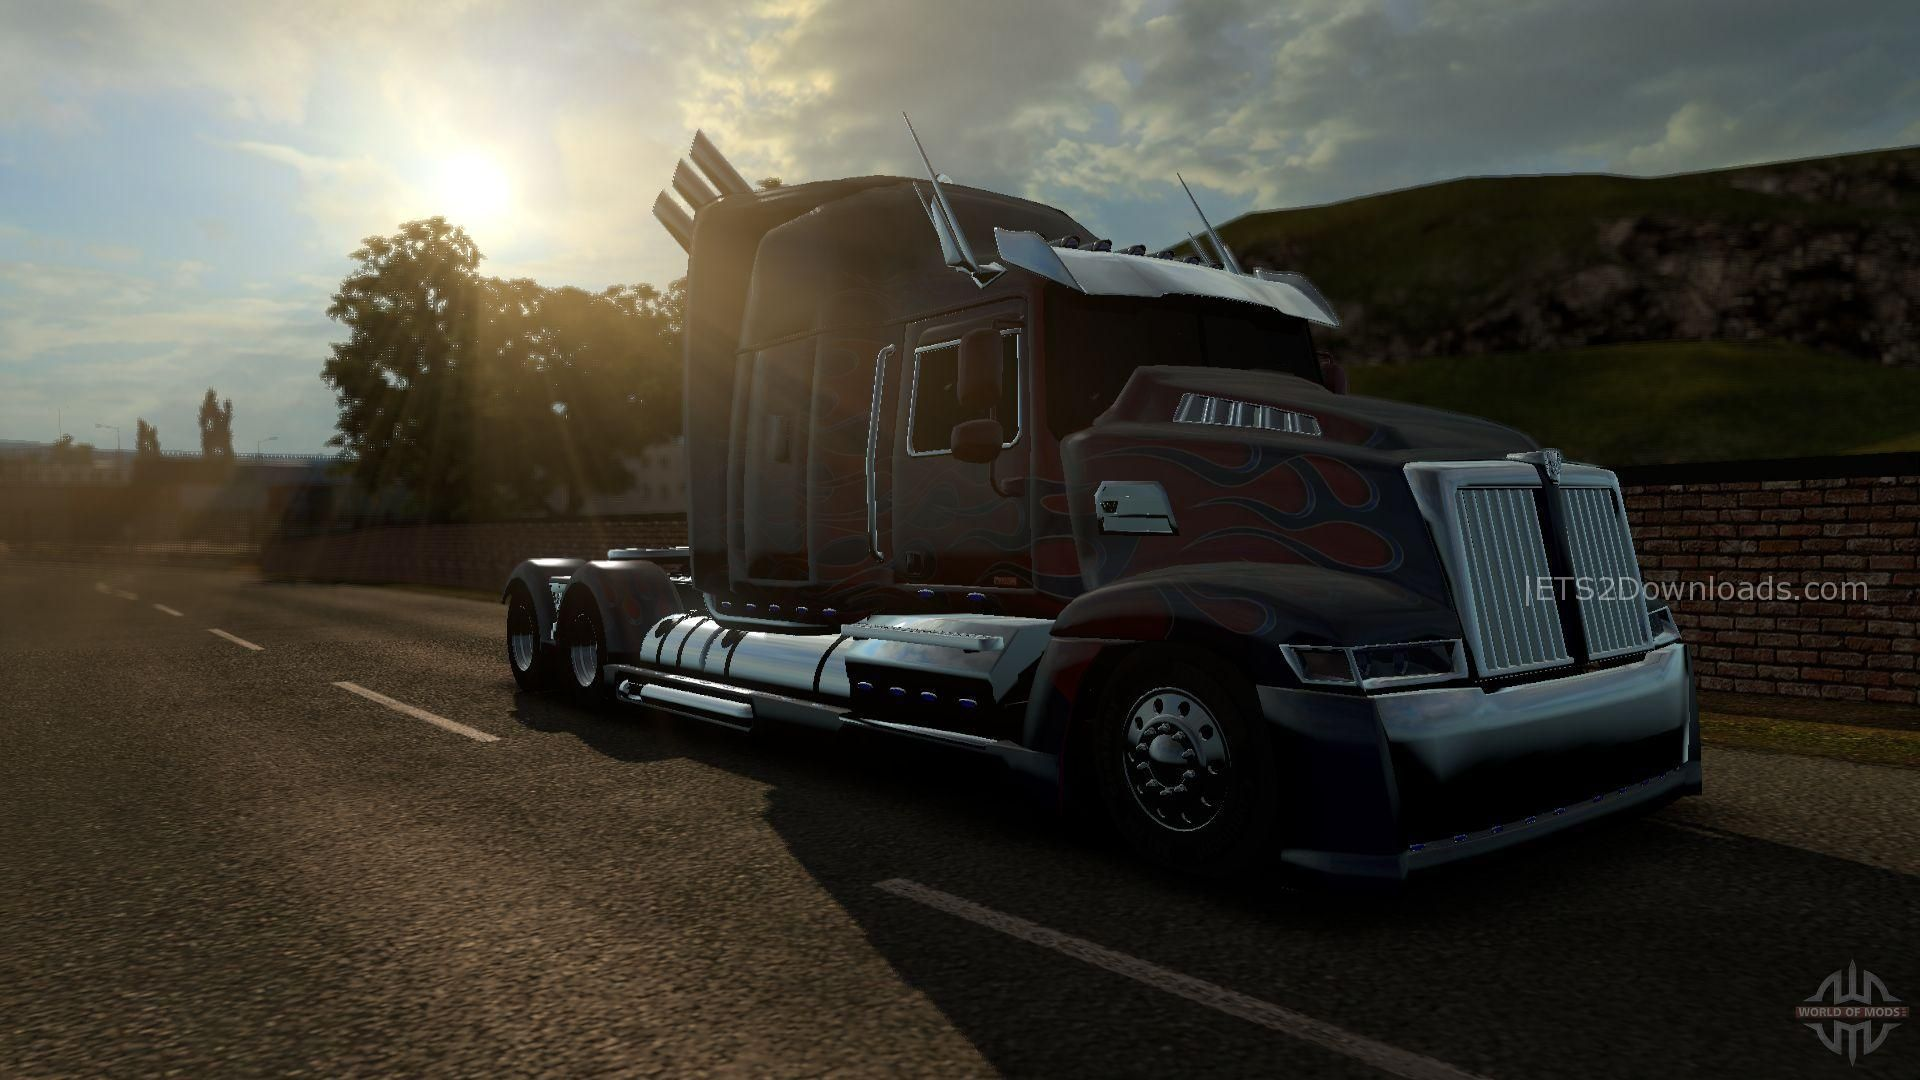 heavy-truck-optimus-prime-transformers-2